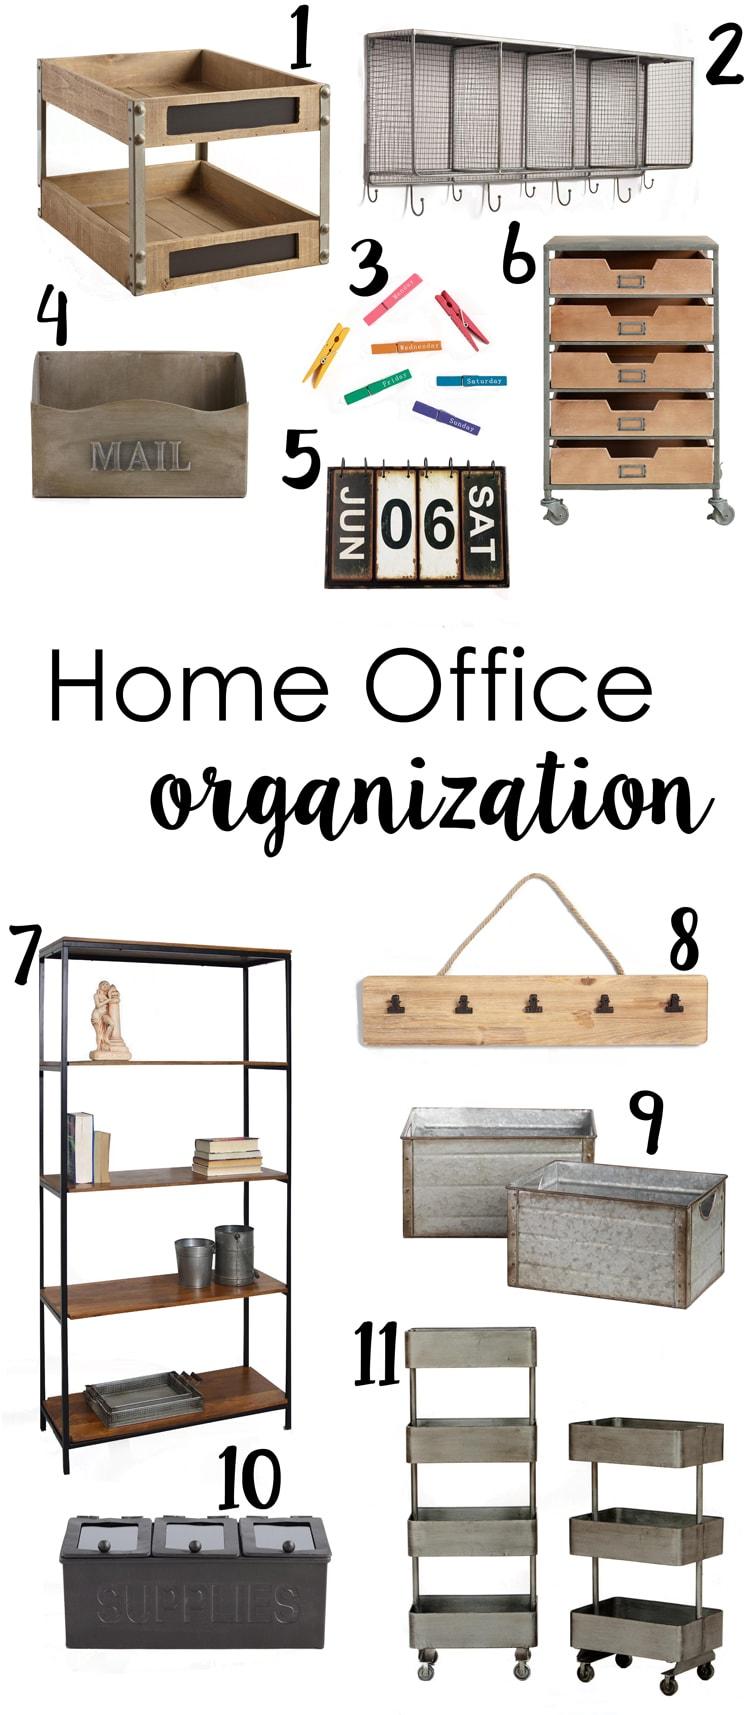 Home Office Organization Ideas - Cutesy Crafts